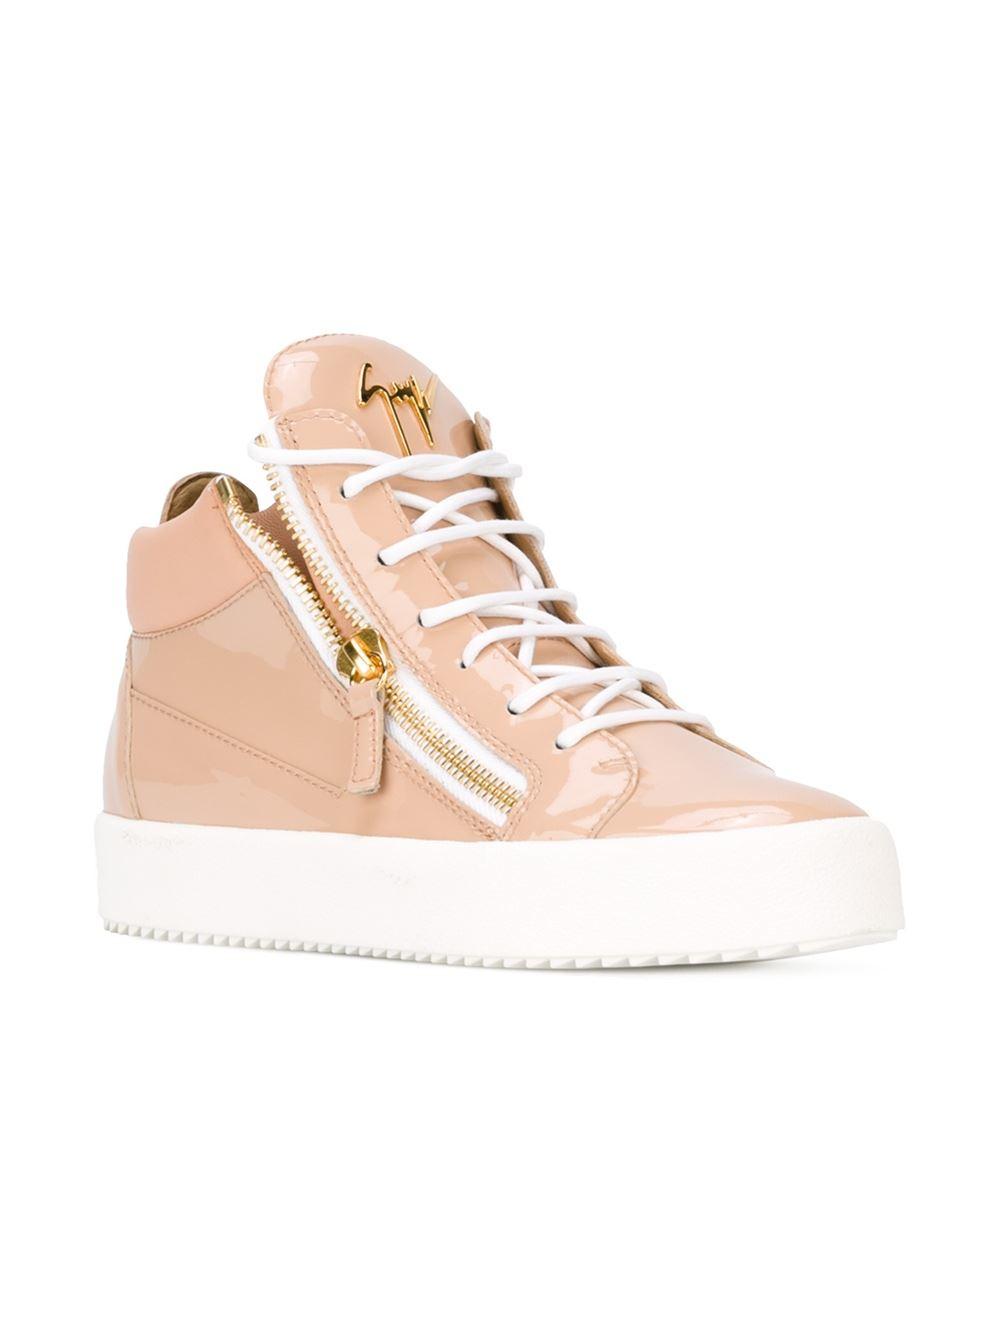 giuseppe zanotti kriss hi top sneakers in pink lyst